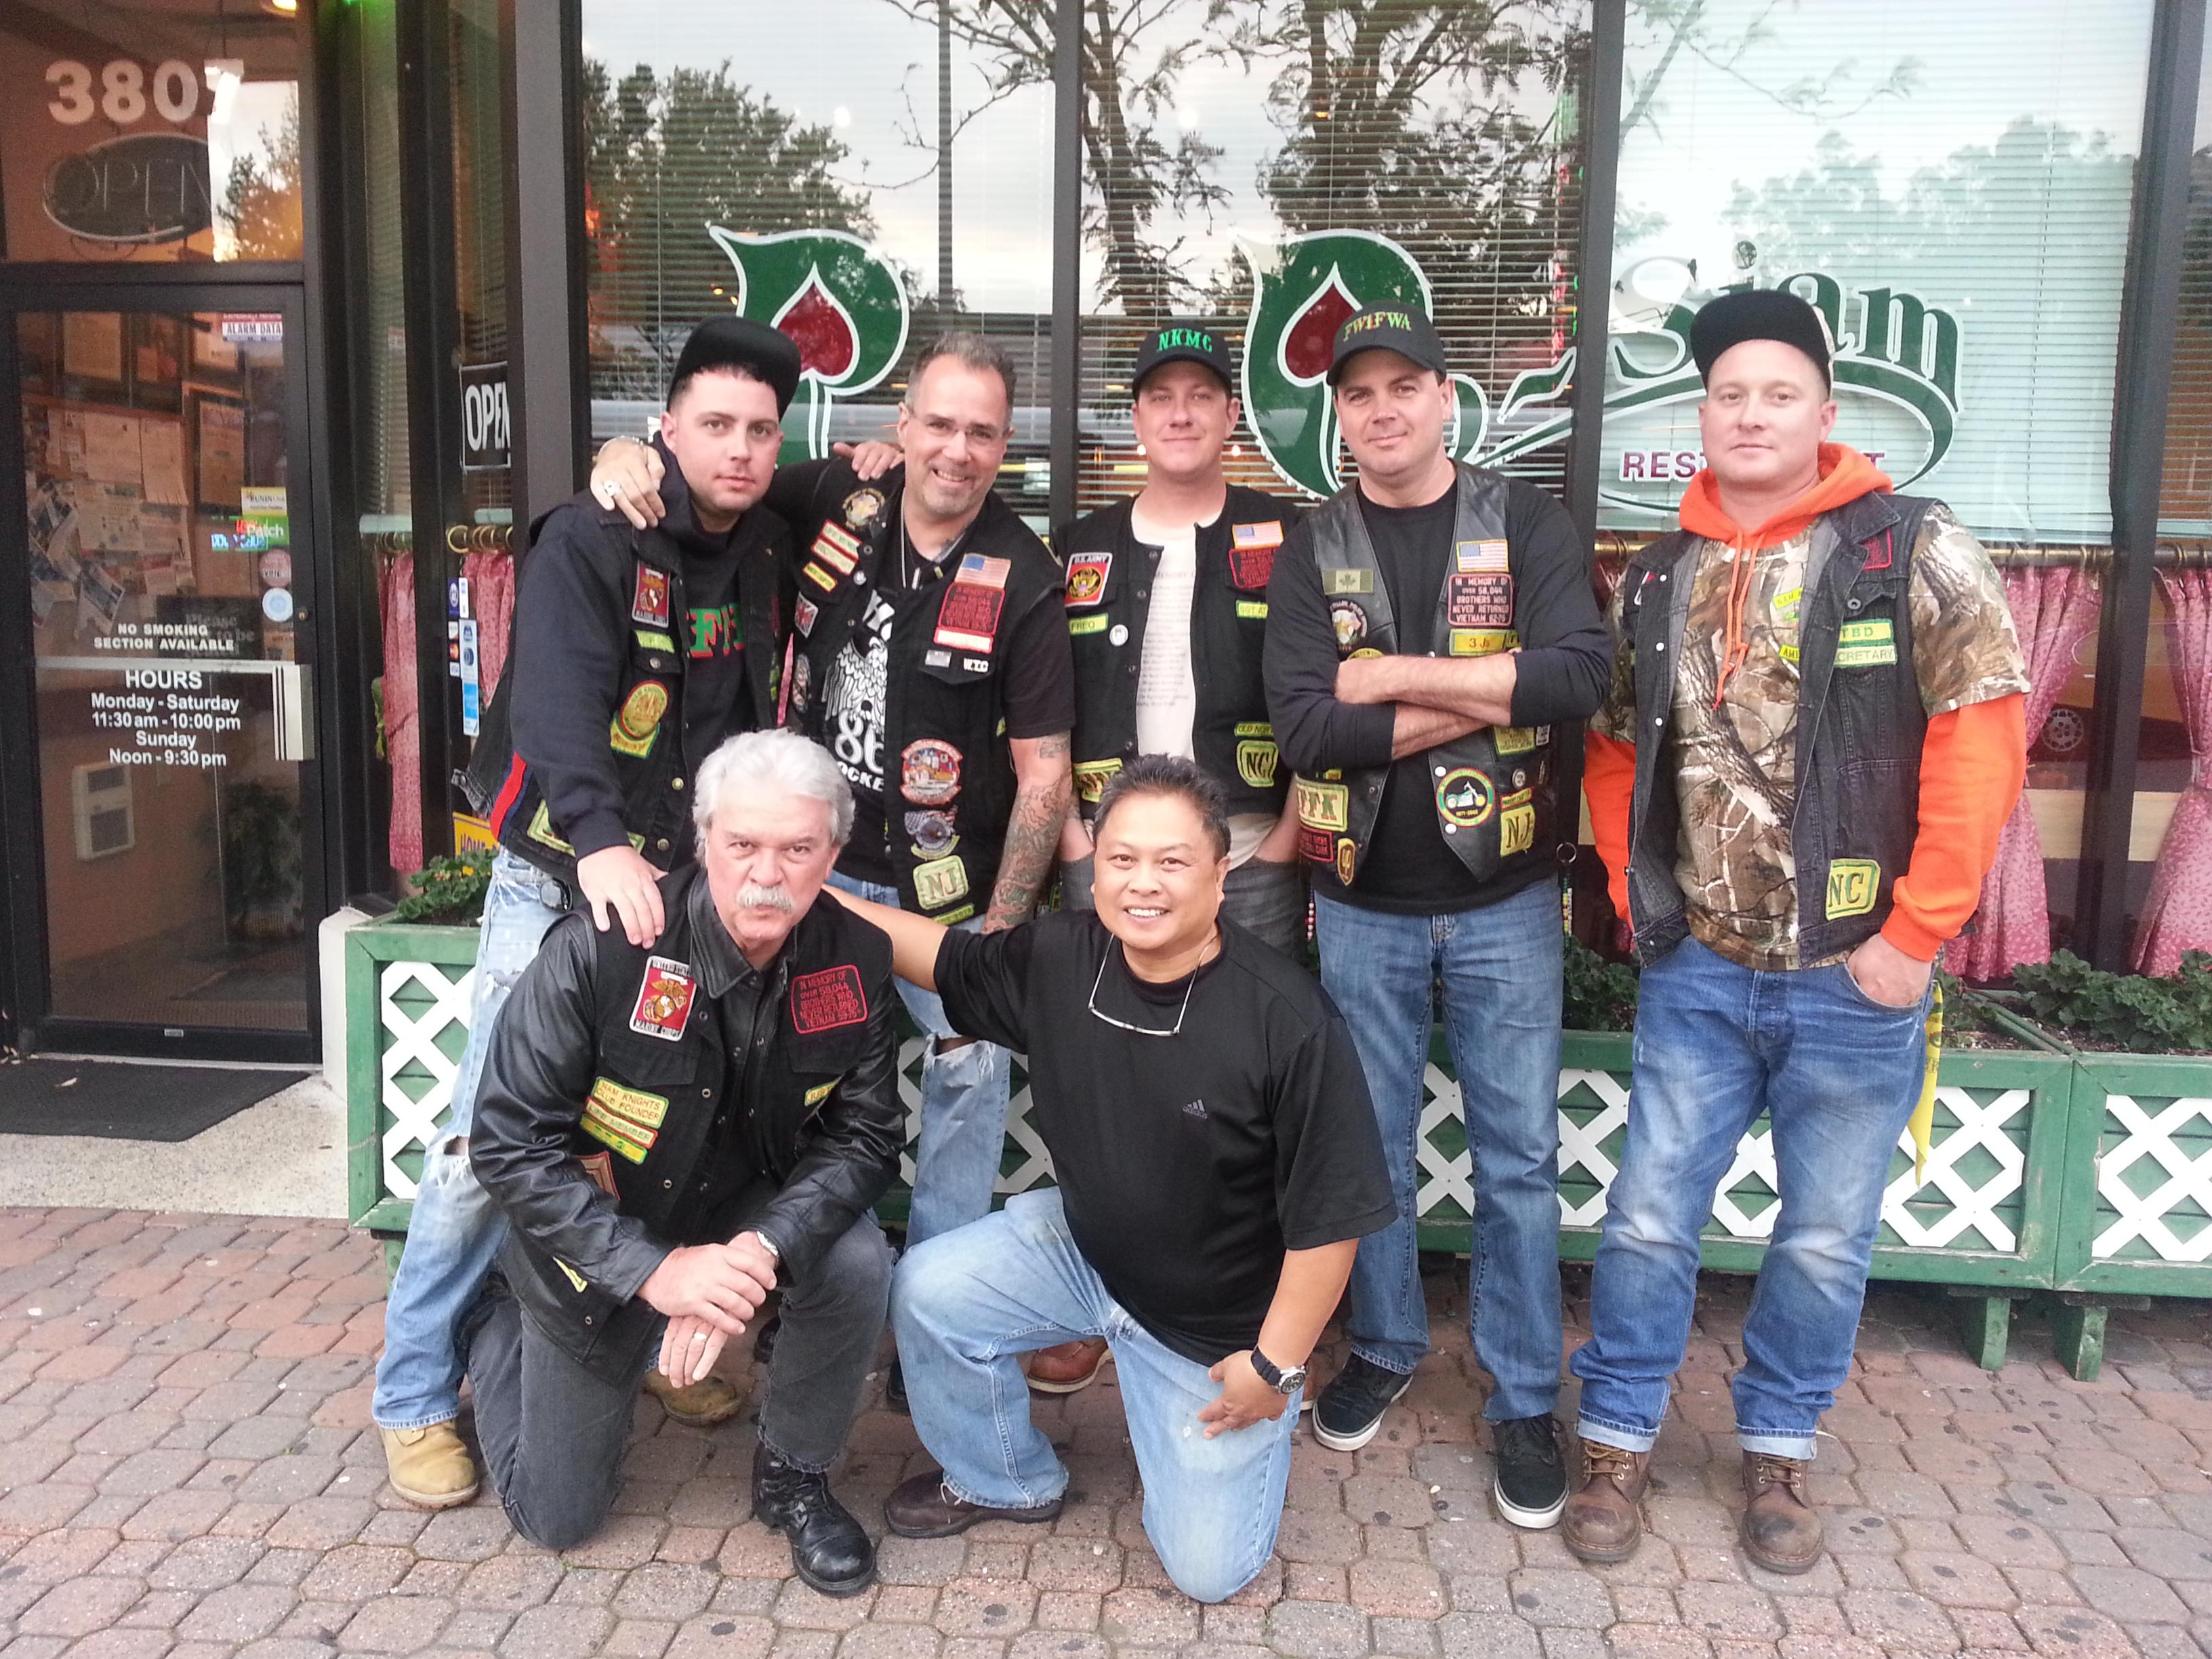 Online Biker Clubs Bbe E Cc A Dd